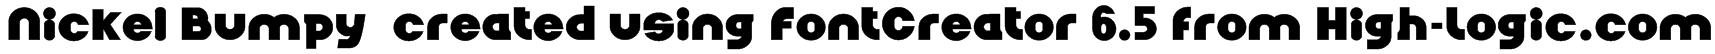 Nickel Bumpy  created using FontCreator 6.5 from High-Logic.com                                            Font